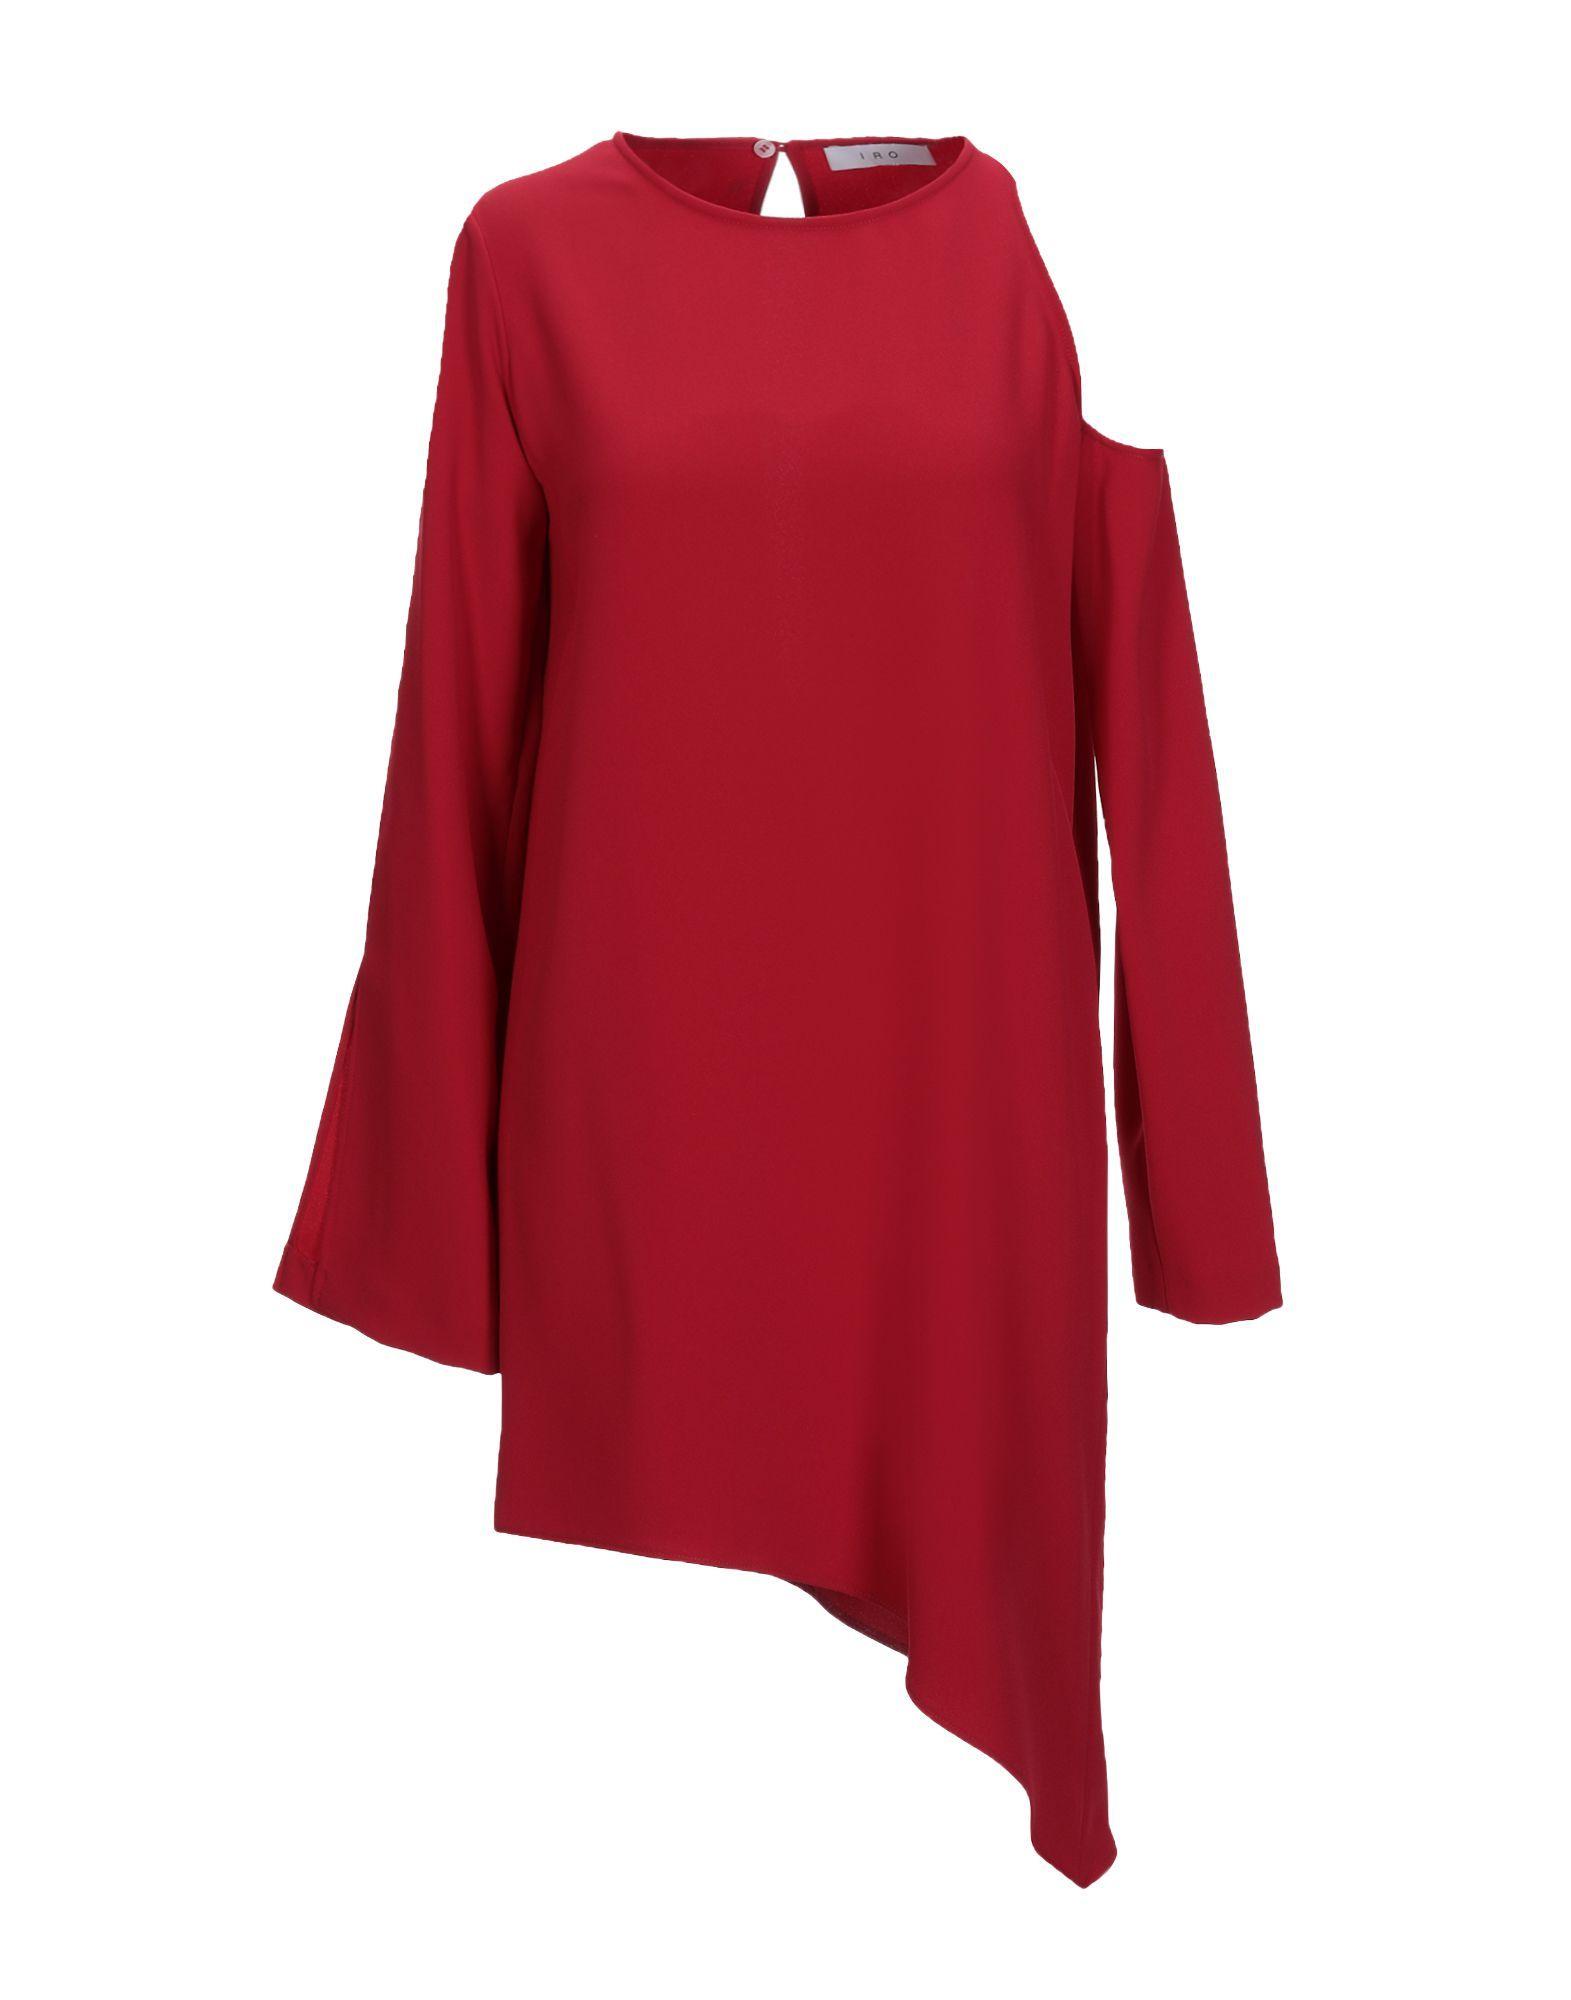 Iro Red Cut Out Shoulder Dress